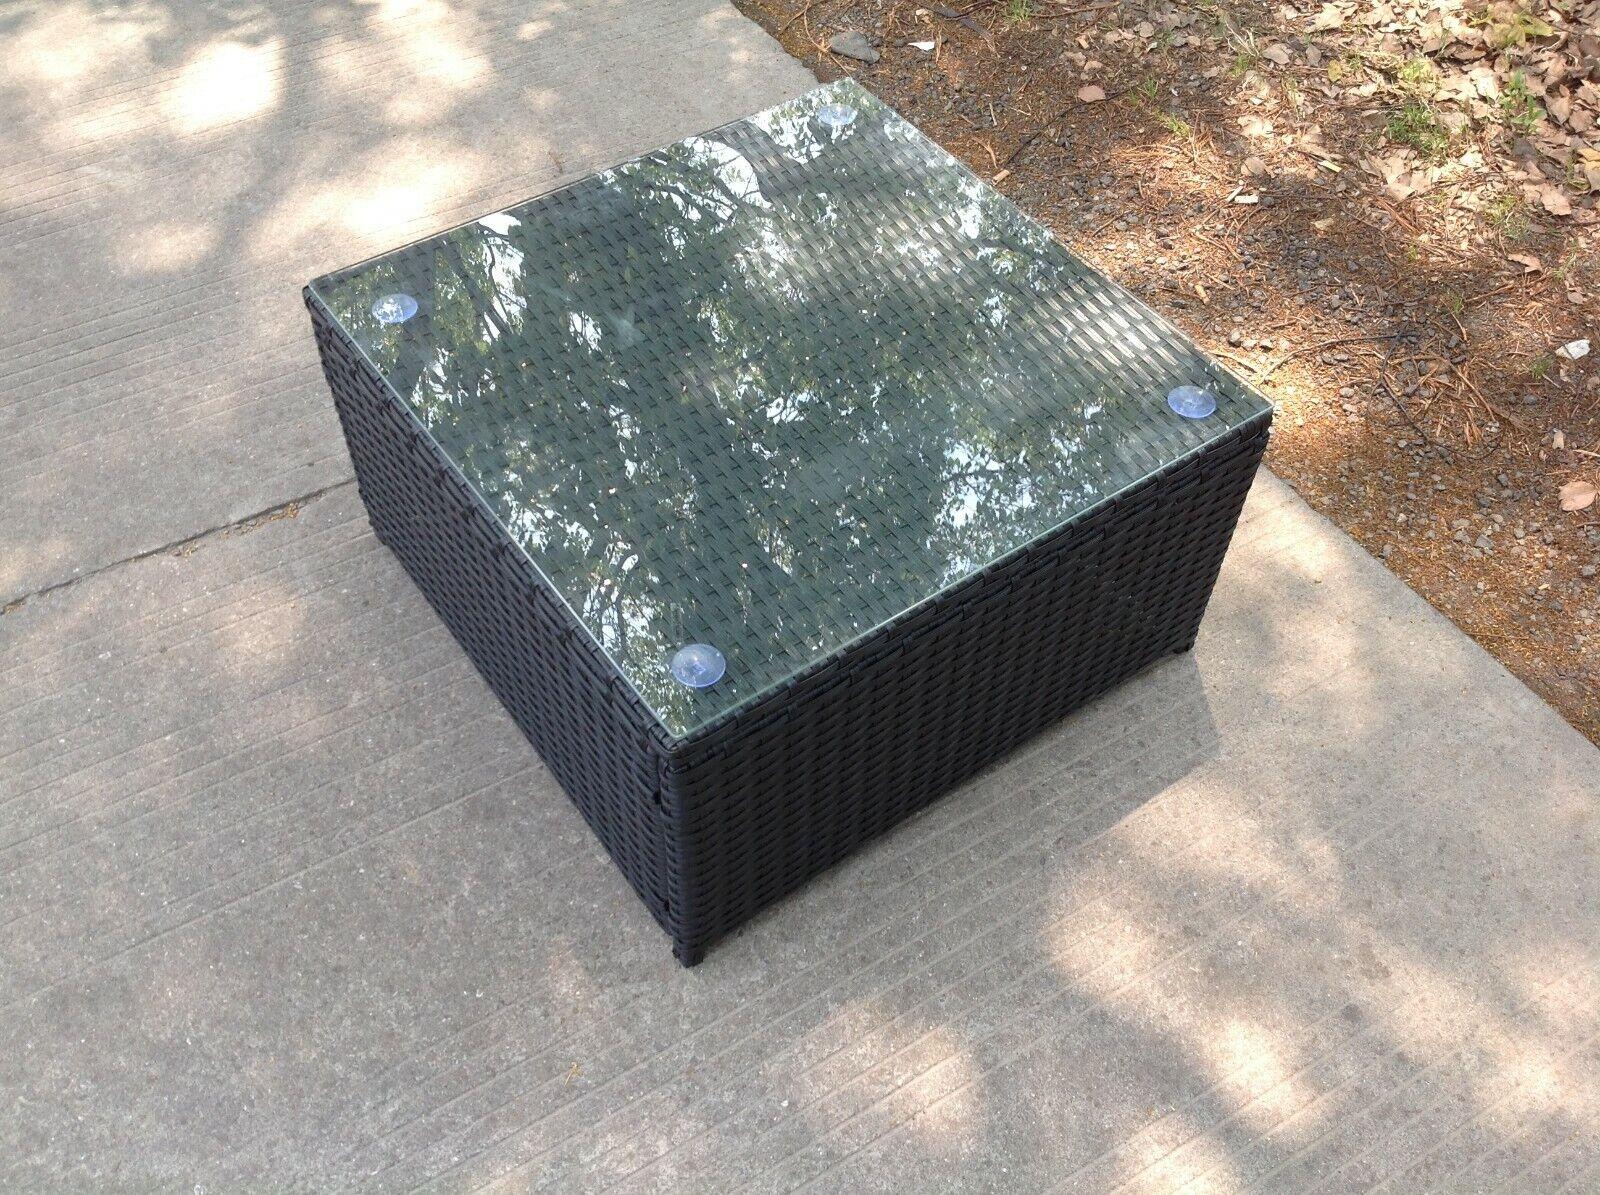 Garden Furniture - Rattan Square Coffee Table Outdoor Garden Furniture patio furniture Black